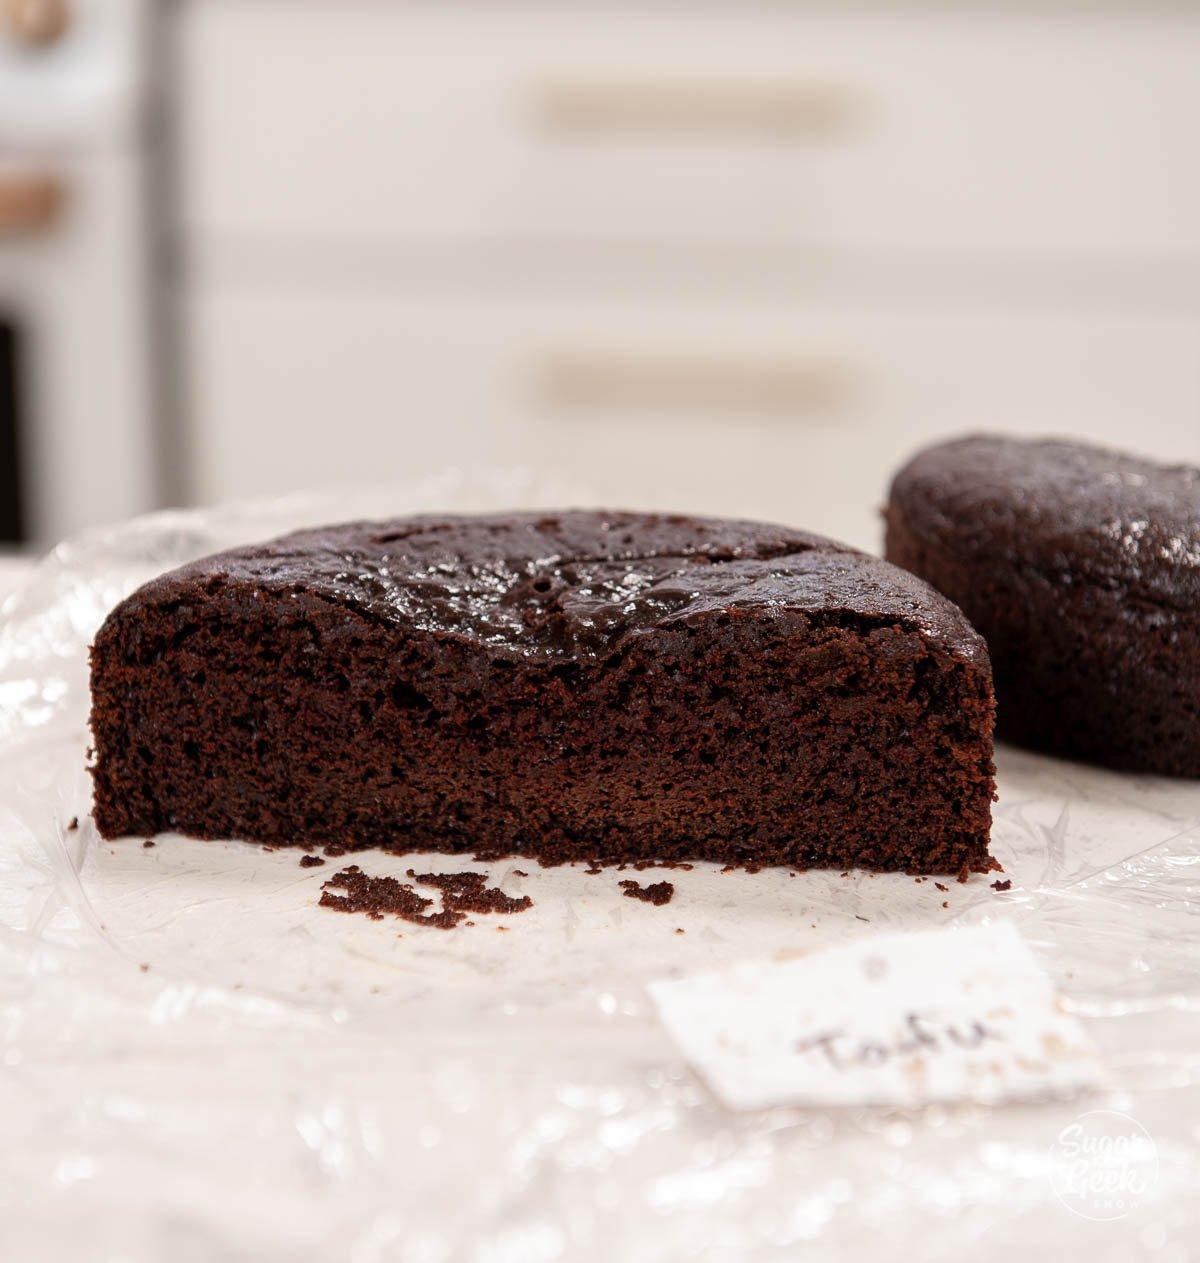 chocolate cake sliced in half